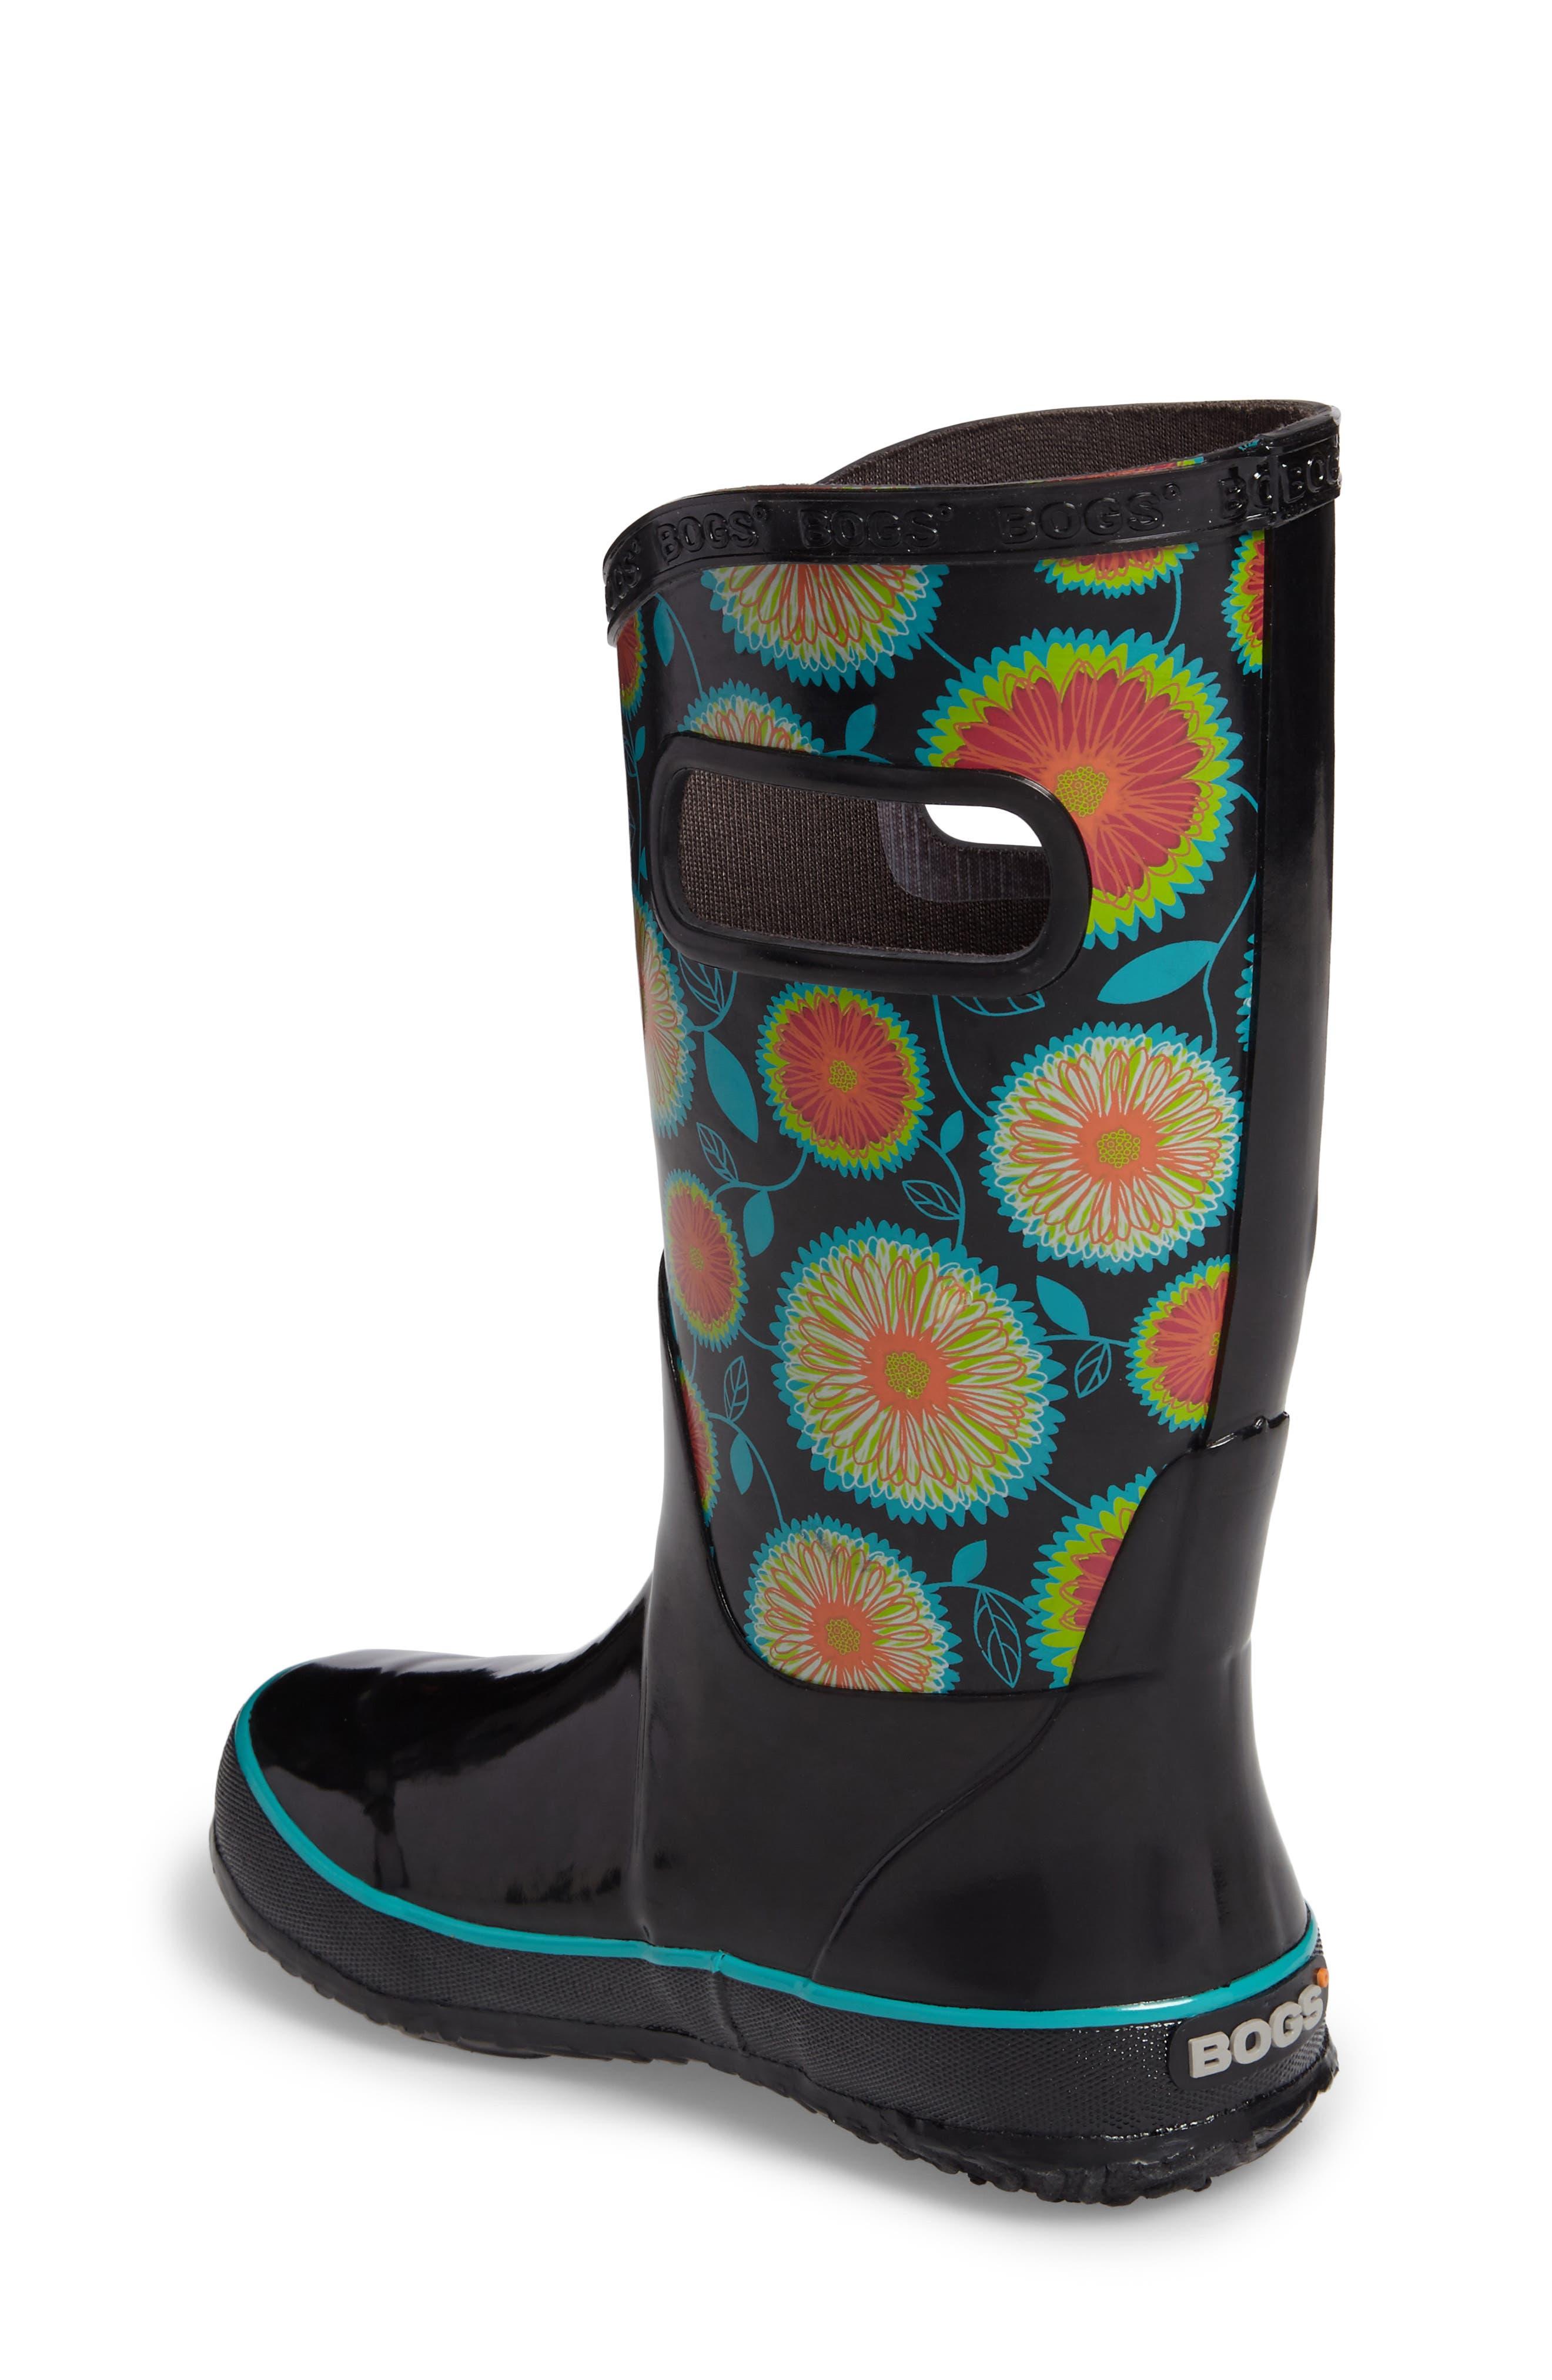 Wildflowers Waterproof Rubber Rain Boot,                             Alternate thumbnail 2, color,                             009